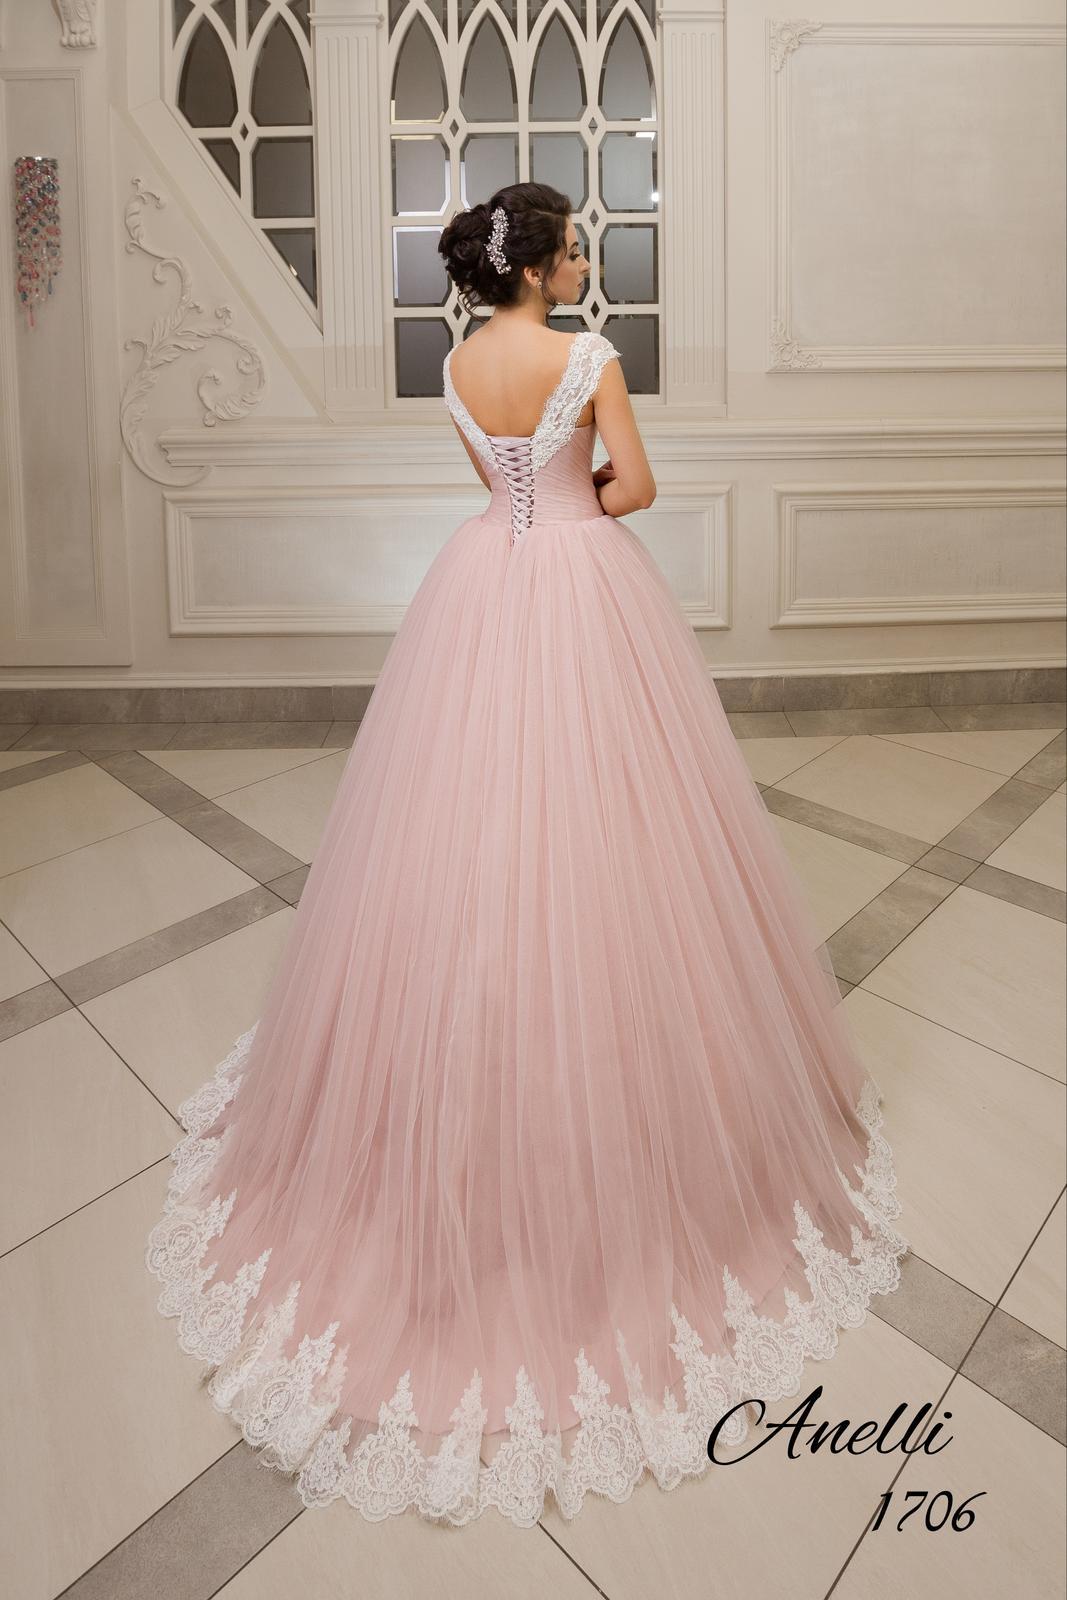 Svadobné šaty - Debut 1706 - Obrázok č. 3